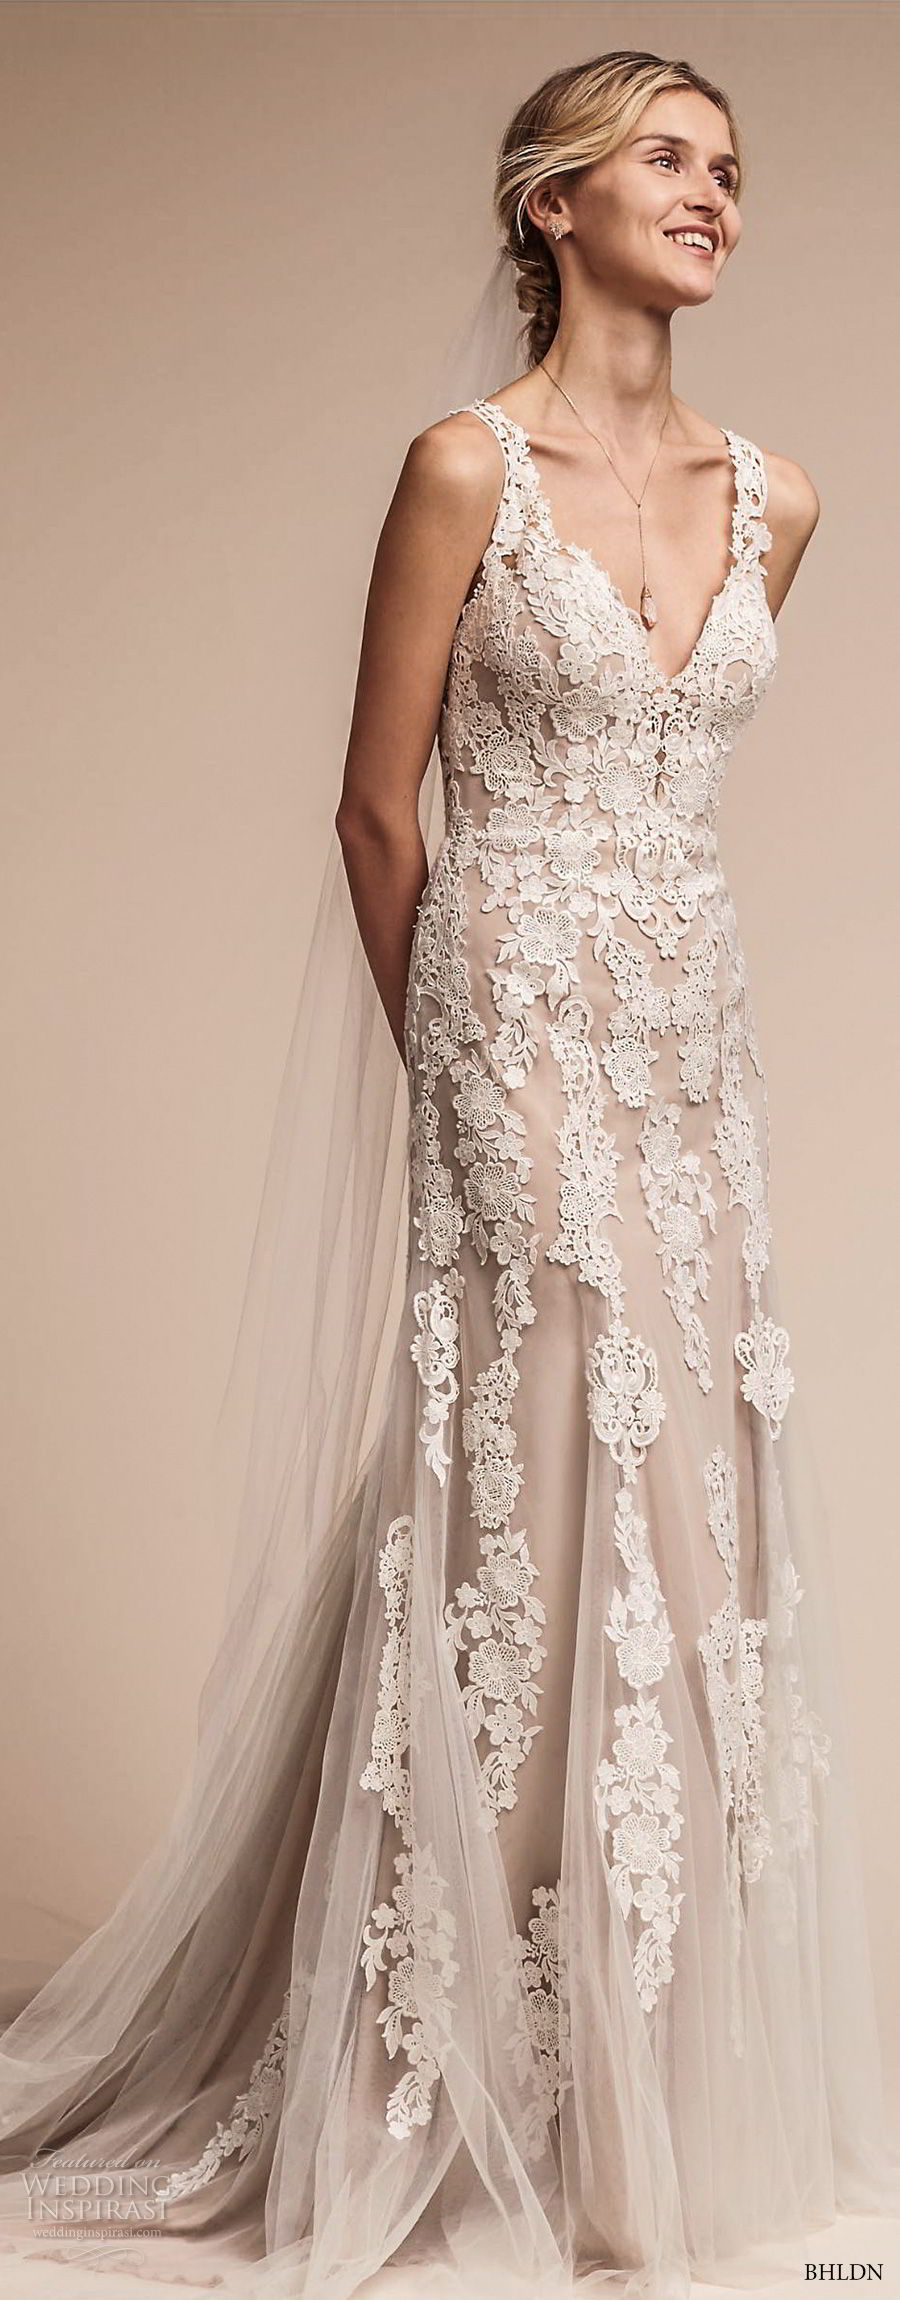 bhldn fall 2017  americana bridal sleeveless embroidered strap heavily embellished bodice elegant romantic sheath a  line wedding dress lace back short train (monarch) fv